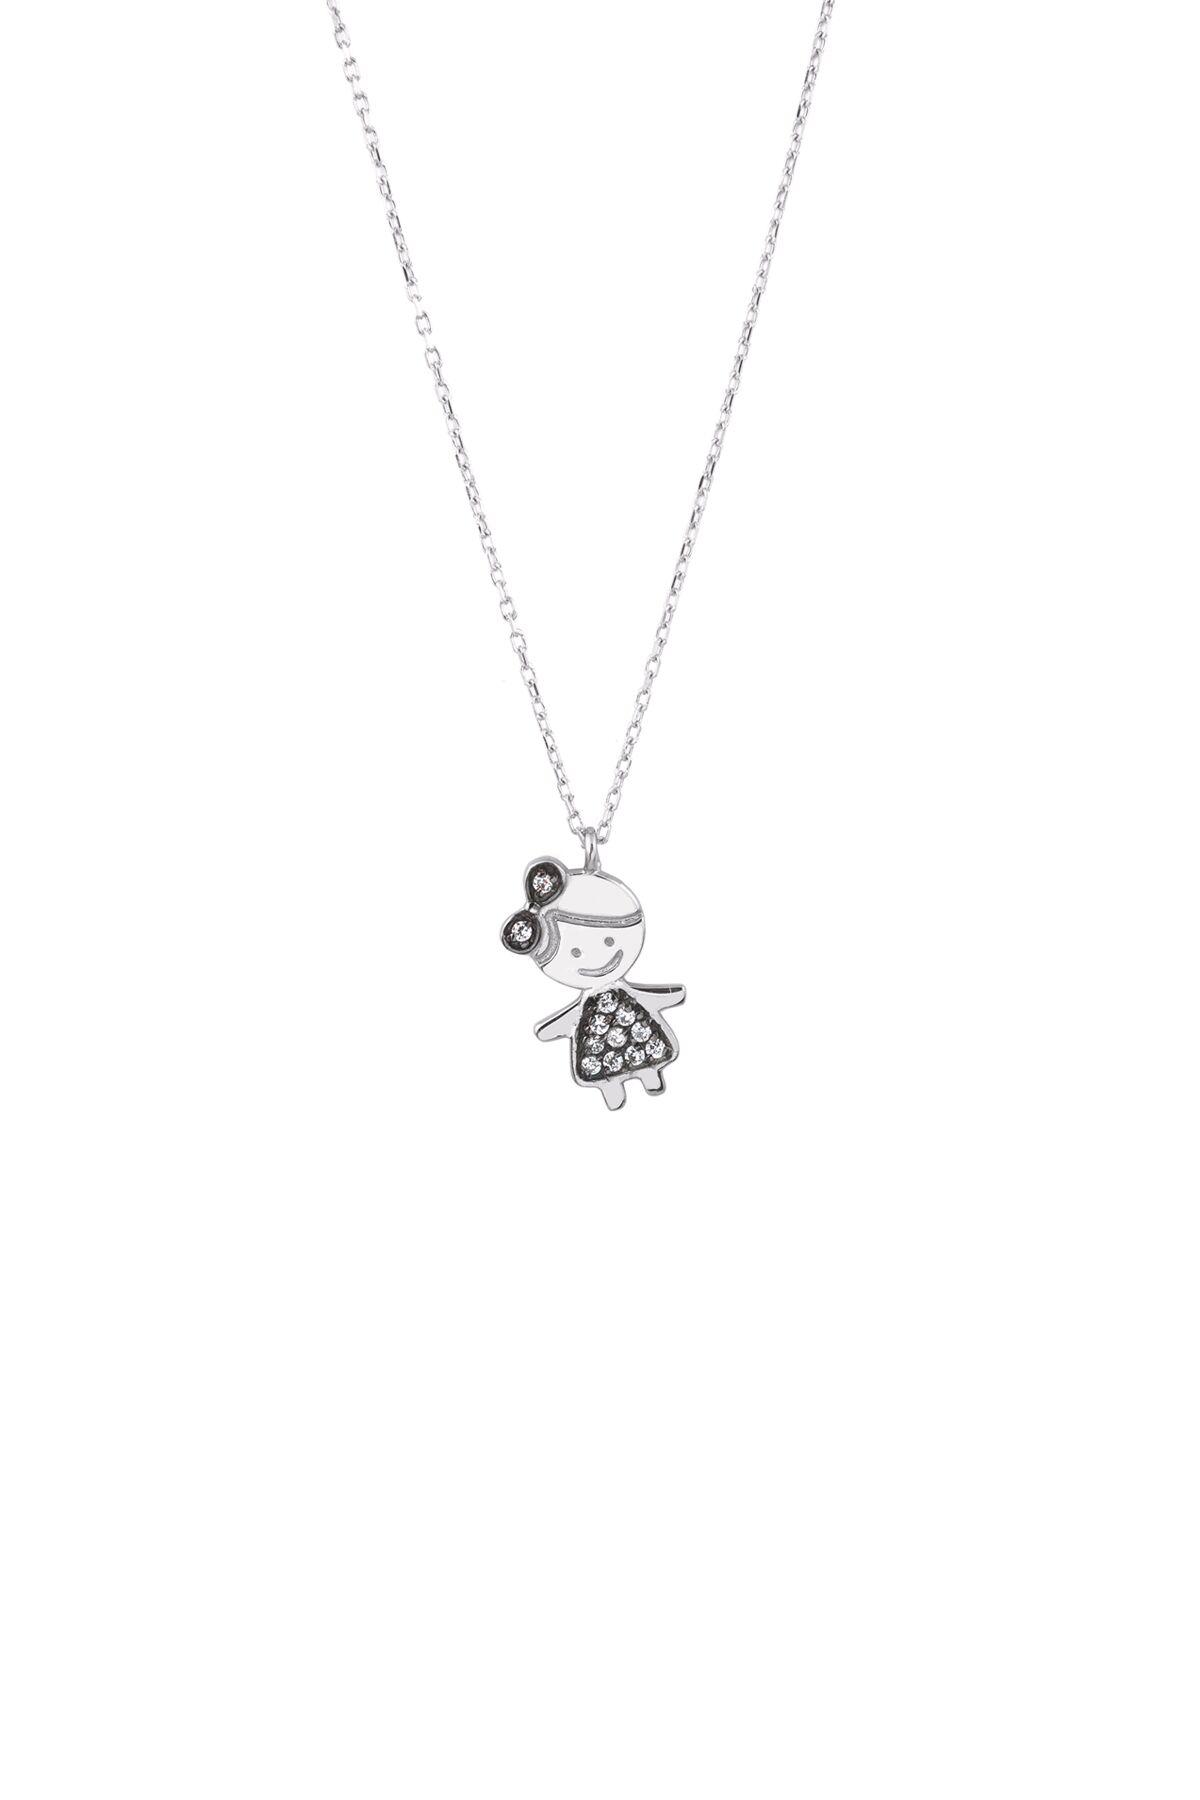 Lola Princess Girl Pendant Necklace